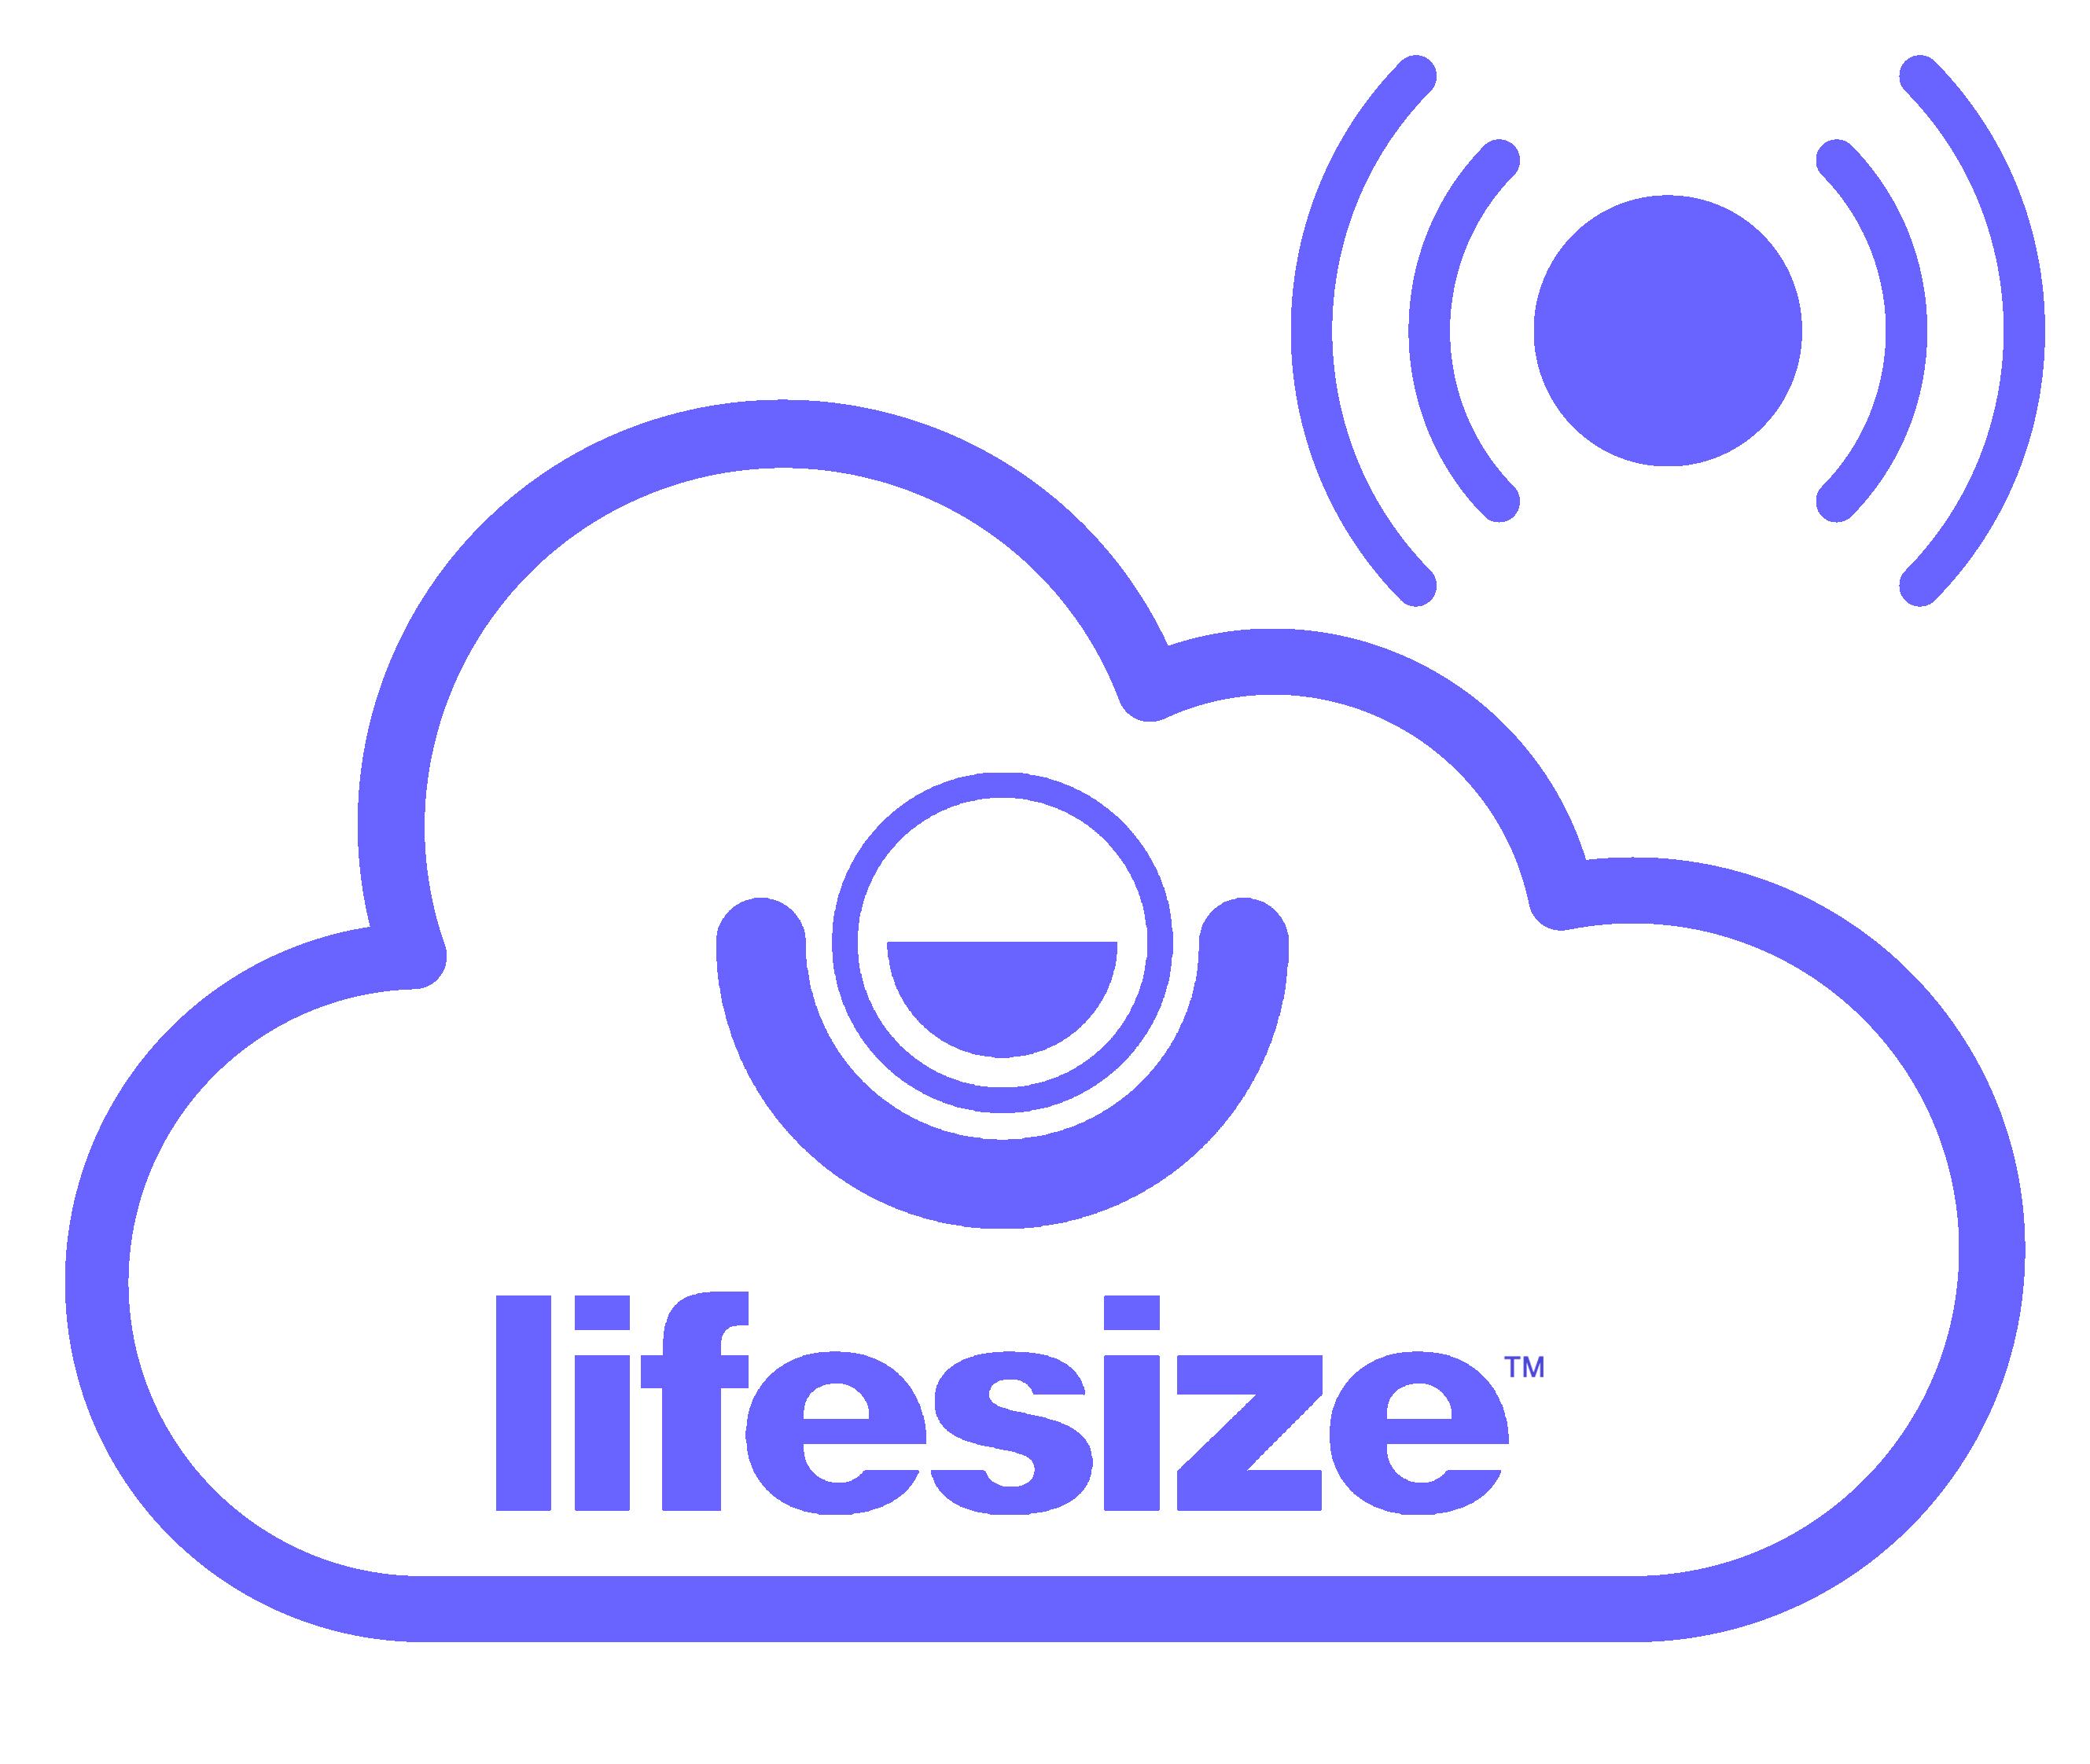 Lifesize Live Stream - 10000 Viewers - 1 yr